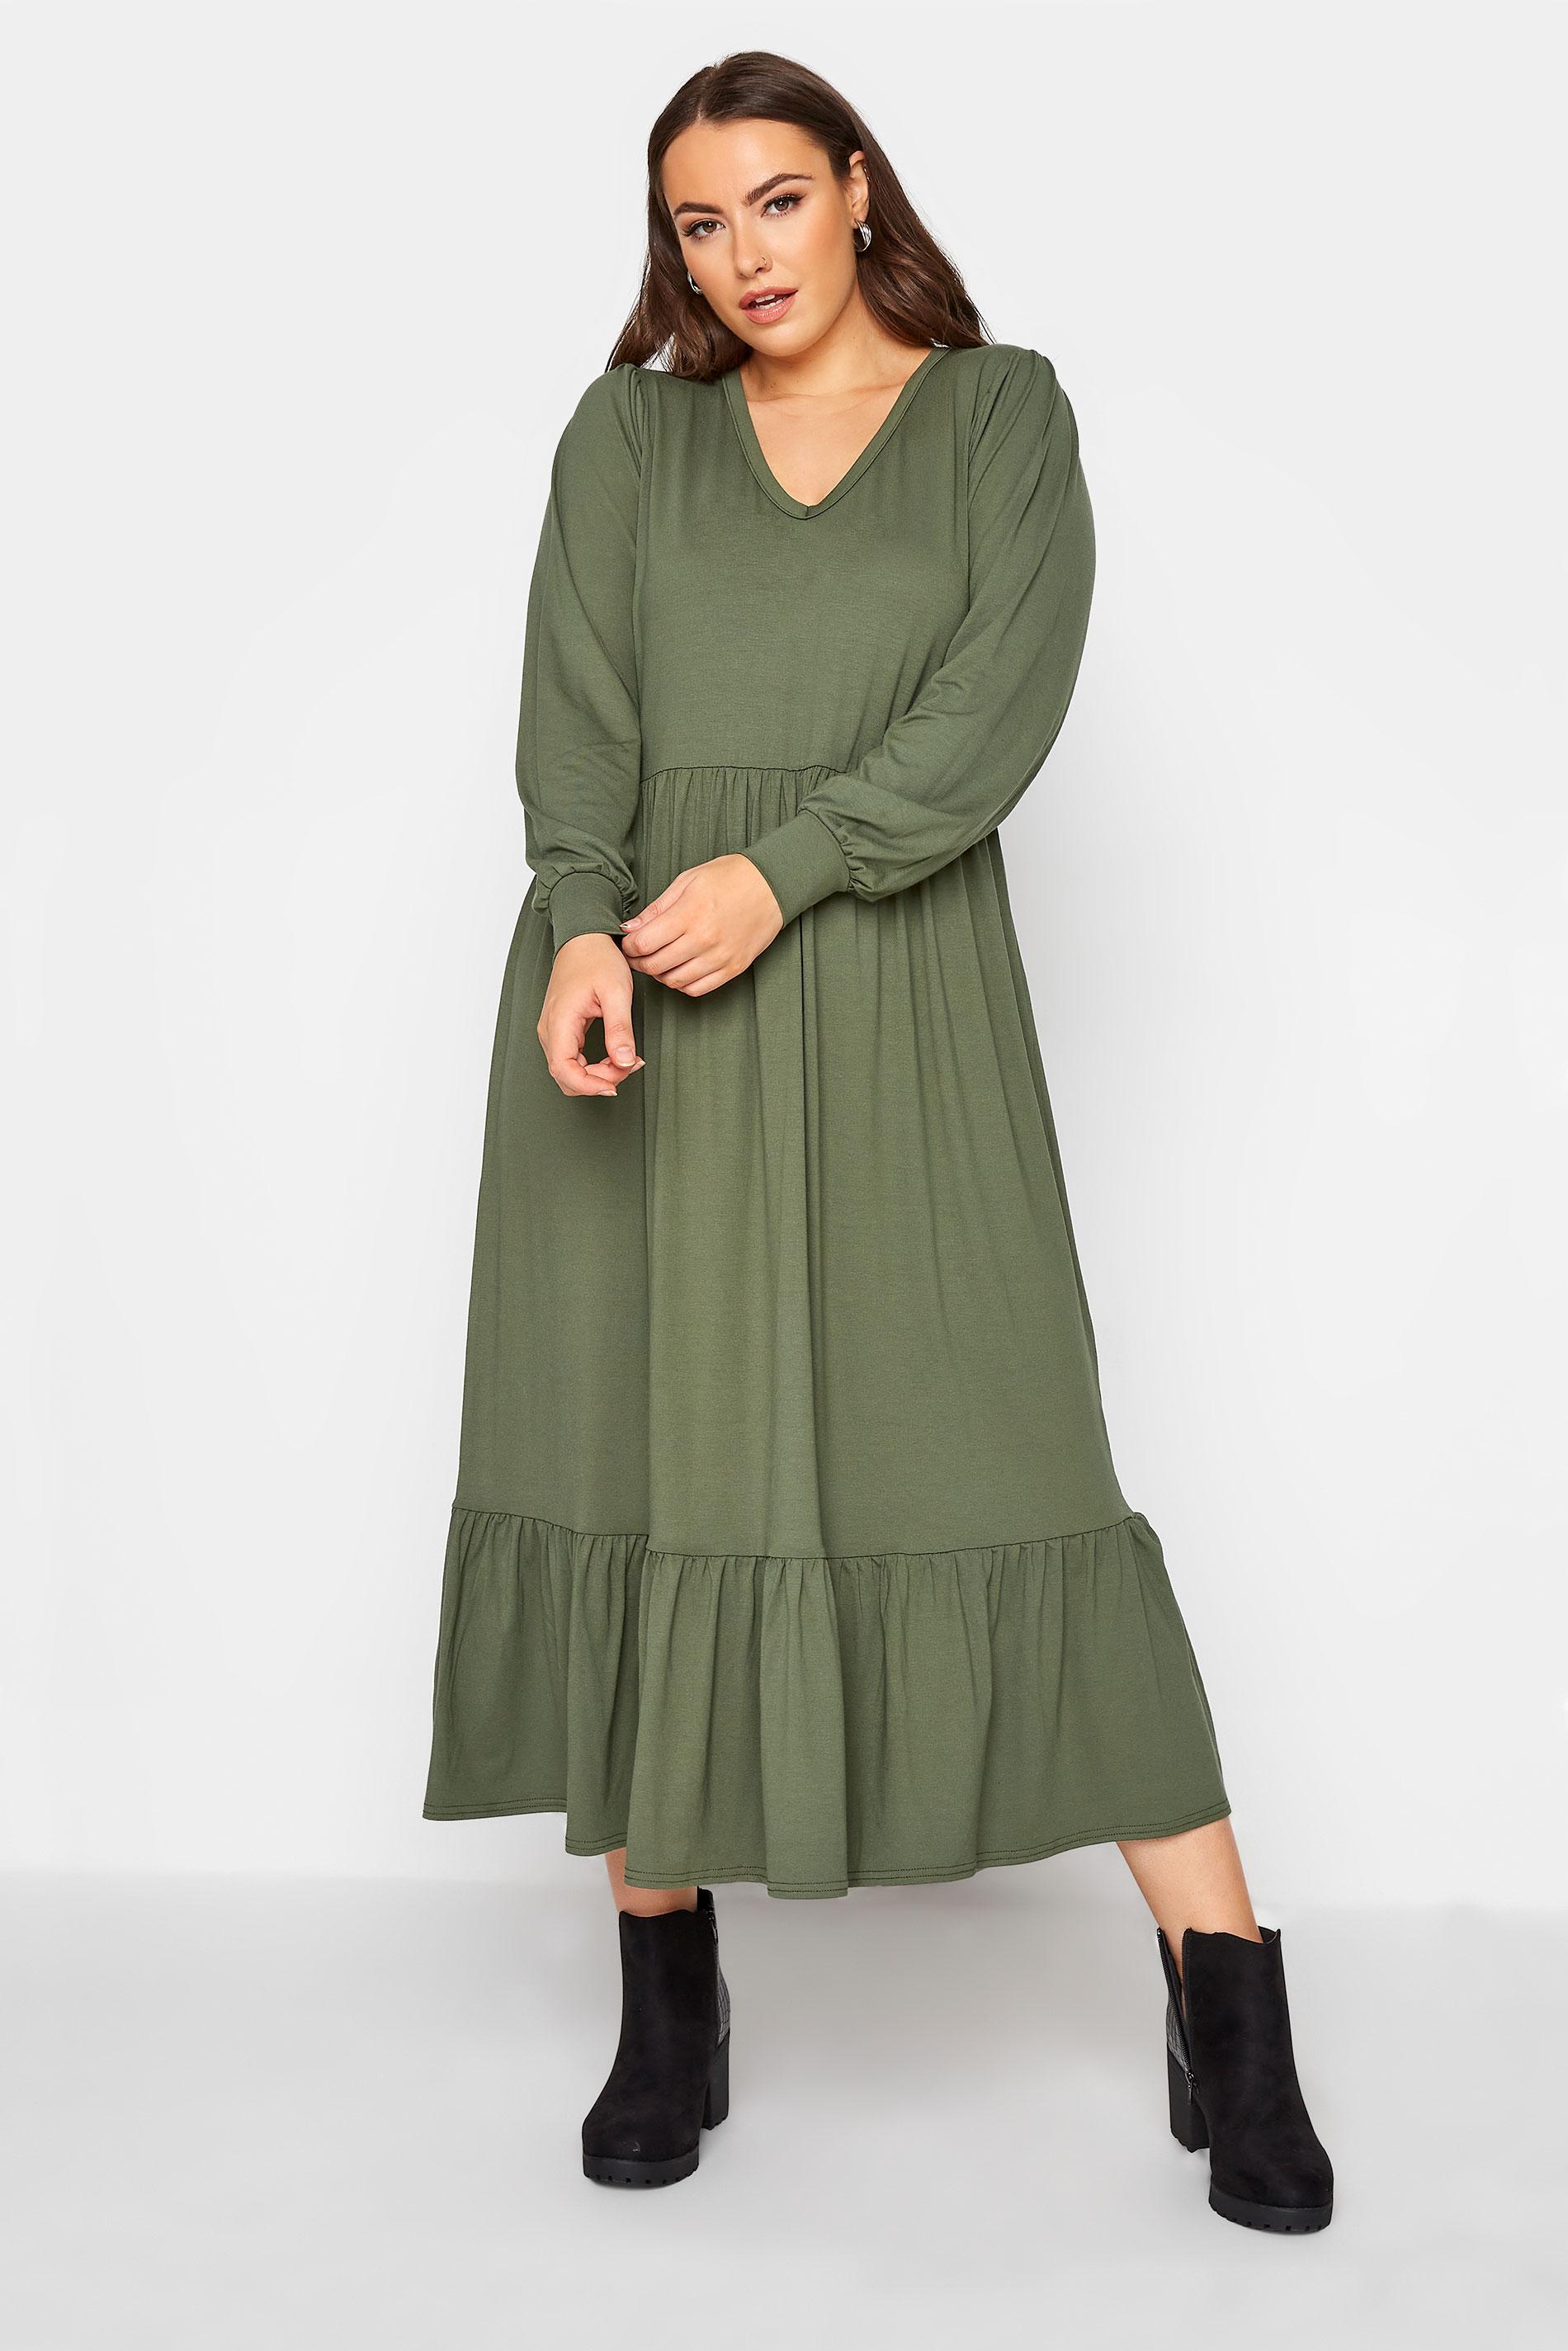 LIMITED COLLECTION Khaki Smock Midi Dress_A.jpg